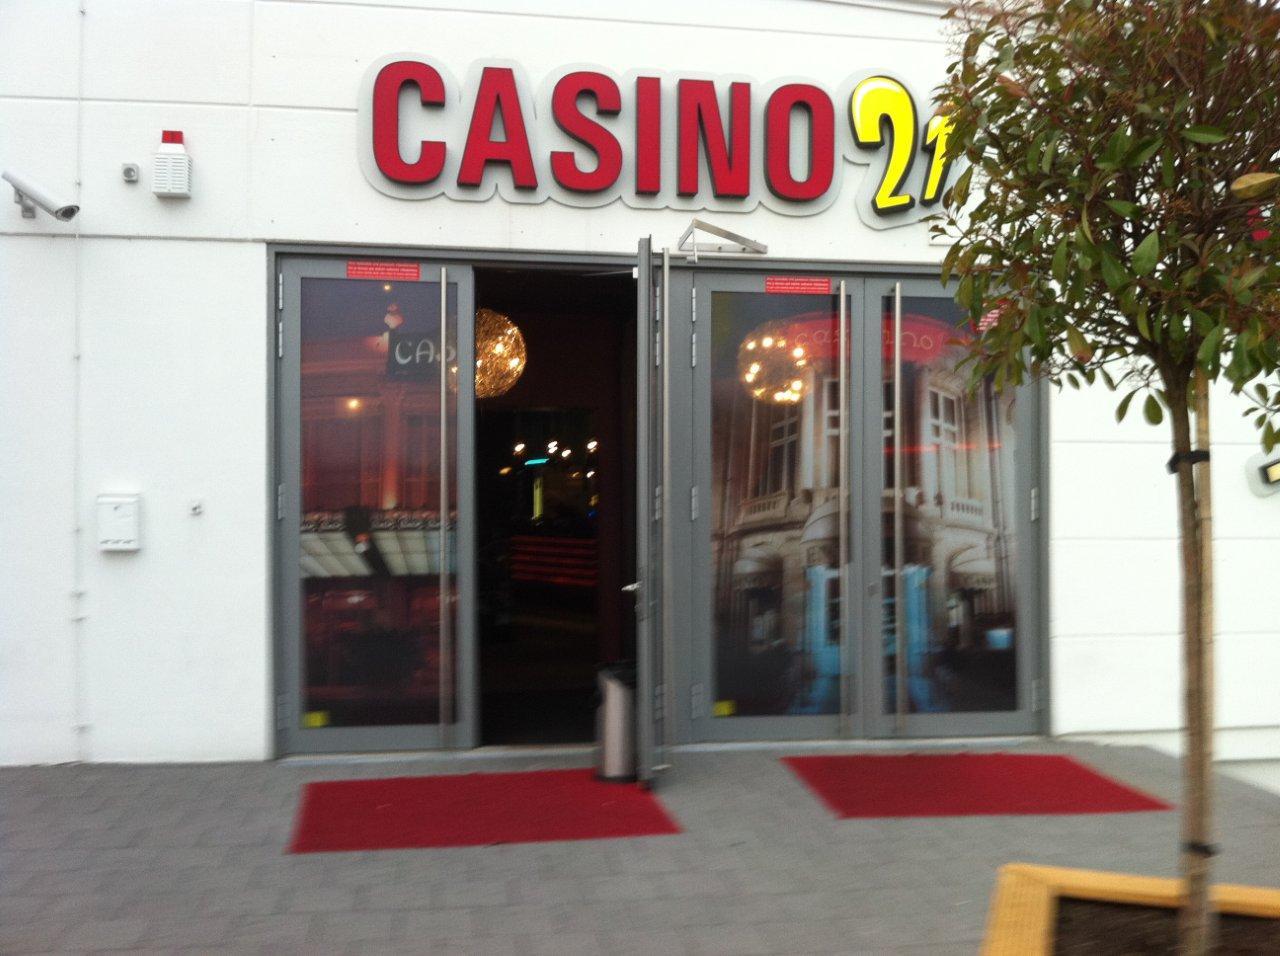 casino am ziegelhof berlin